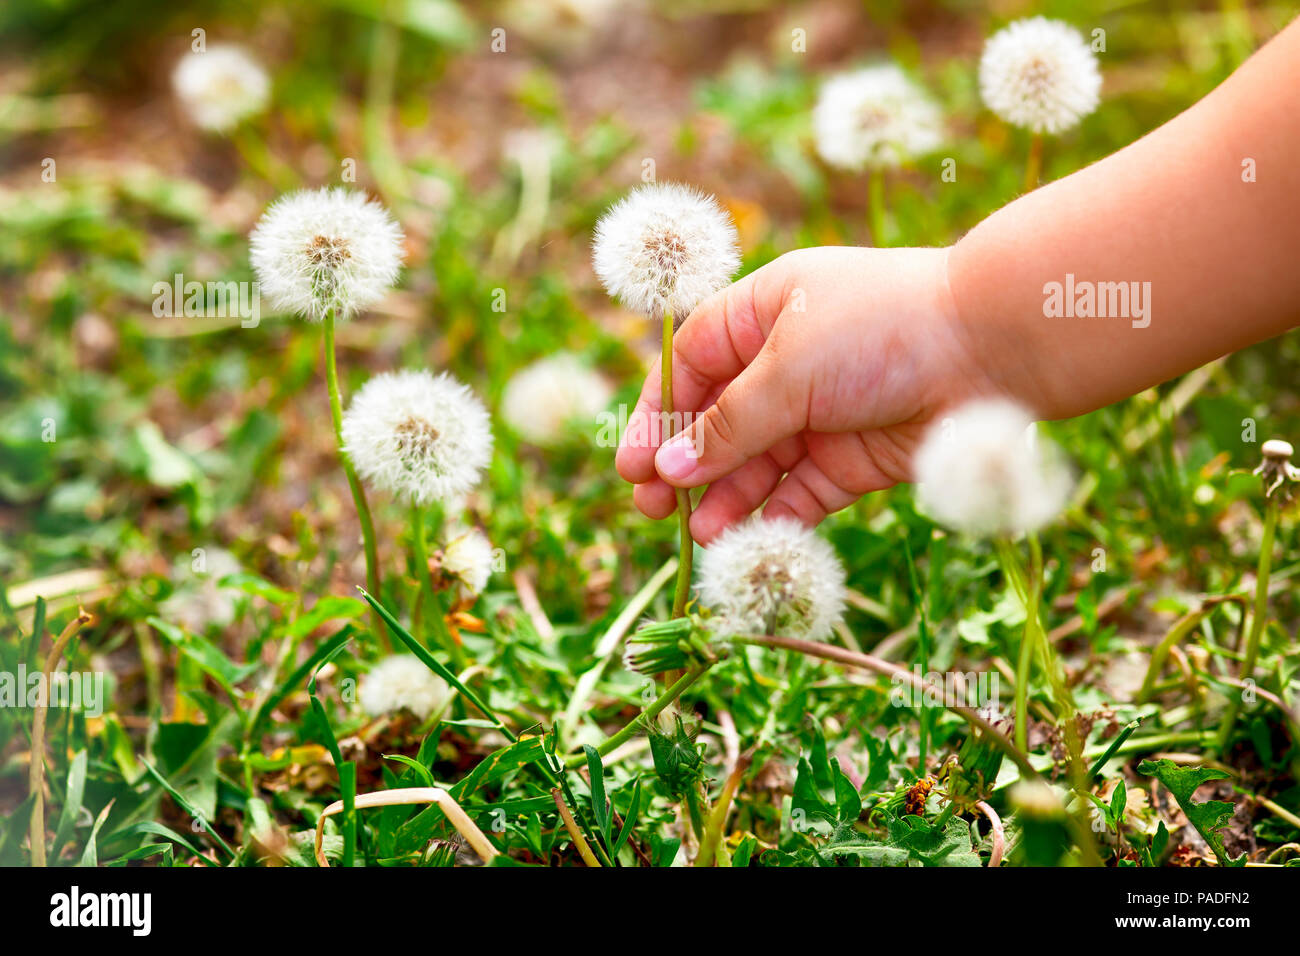 Child hand picking white dandelion. - Stock Image